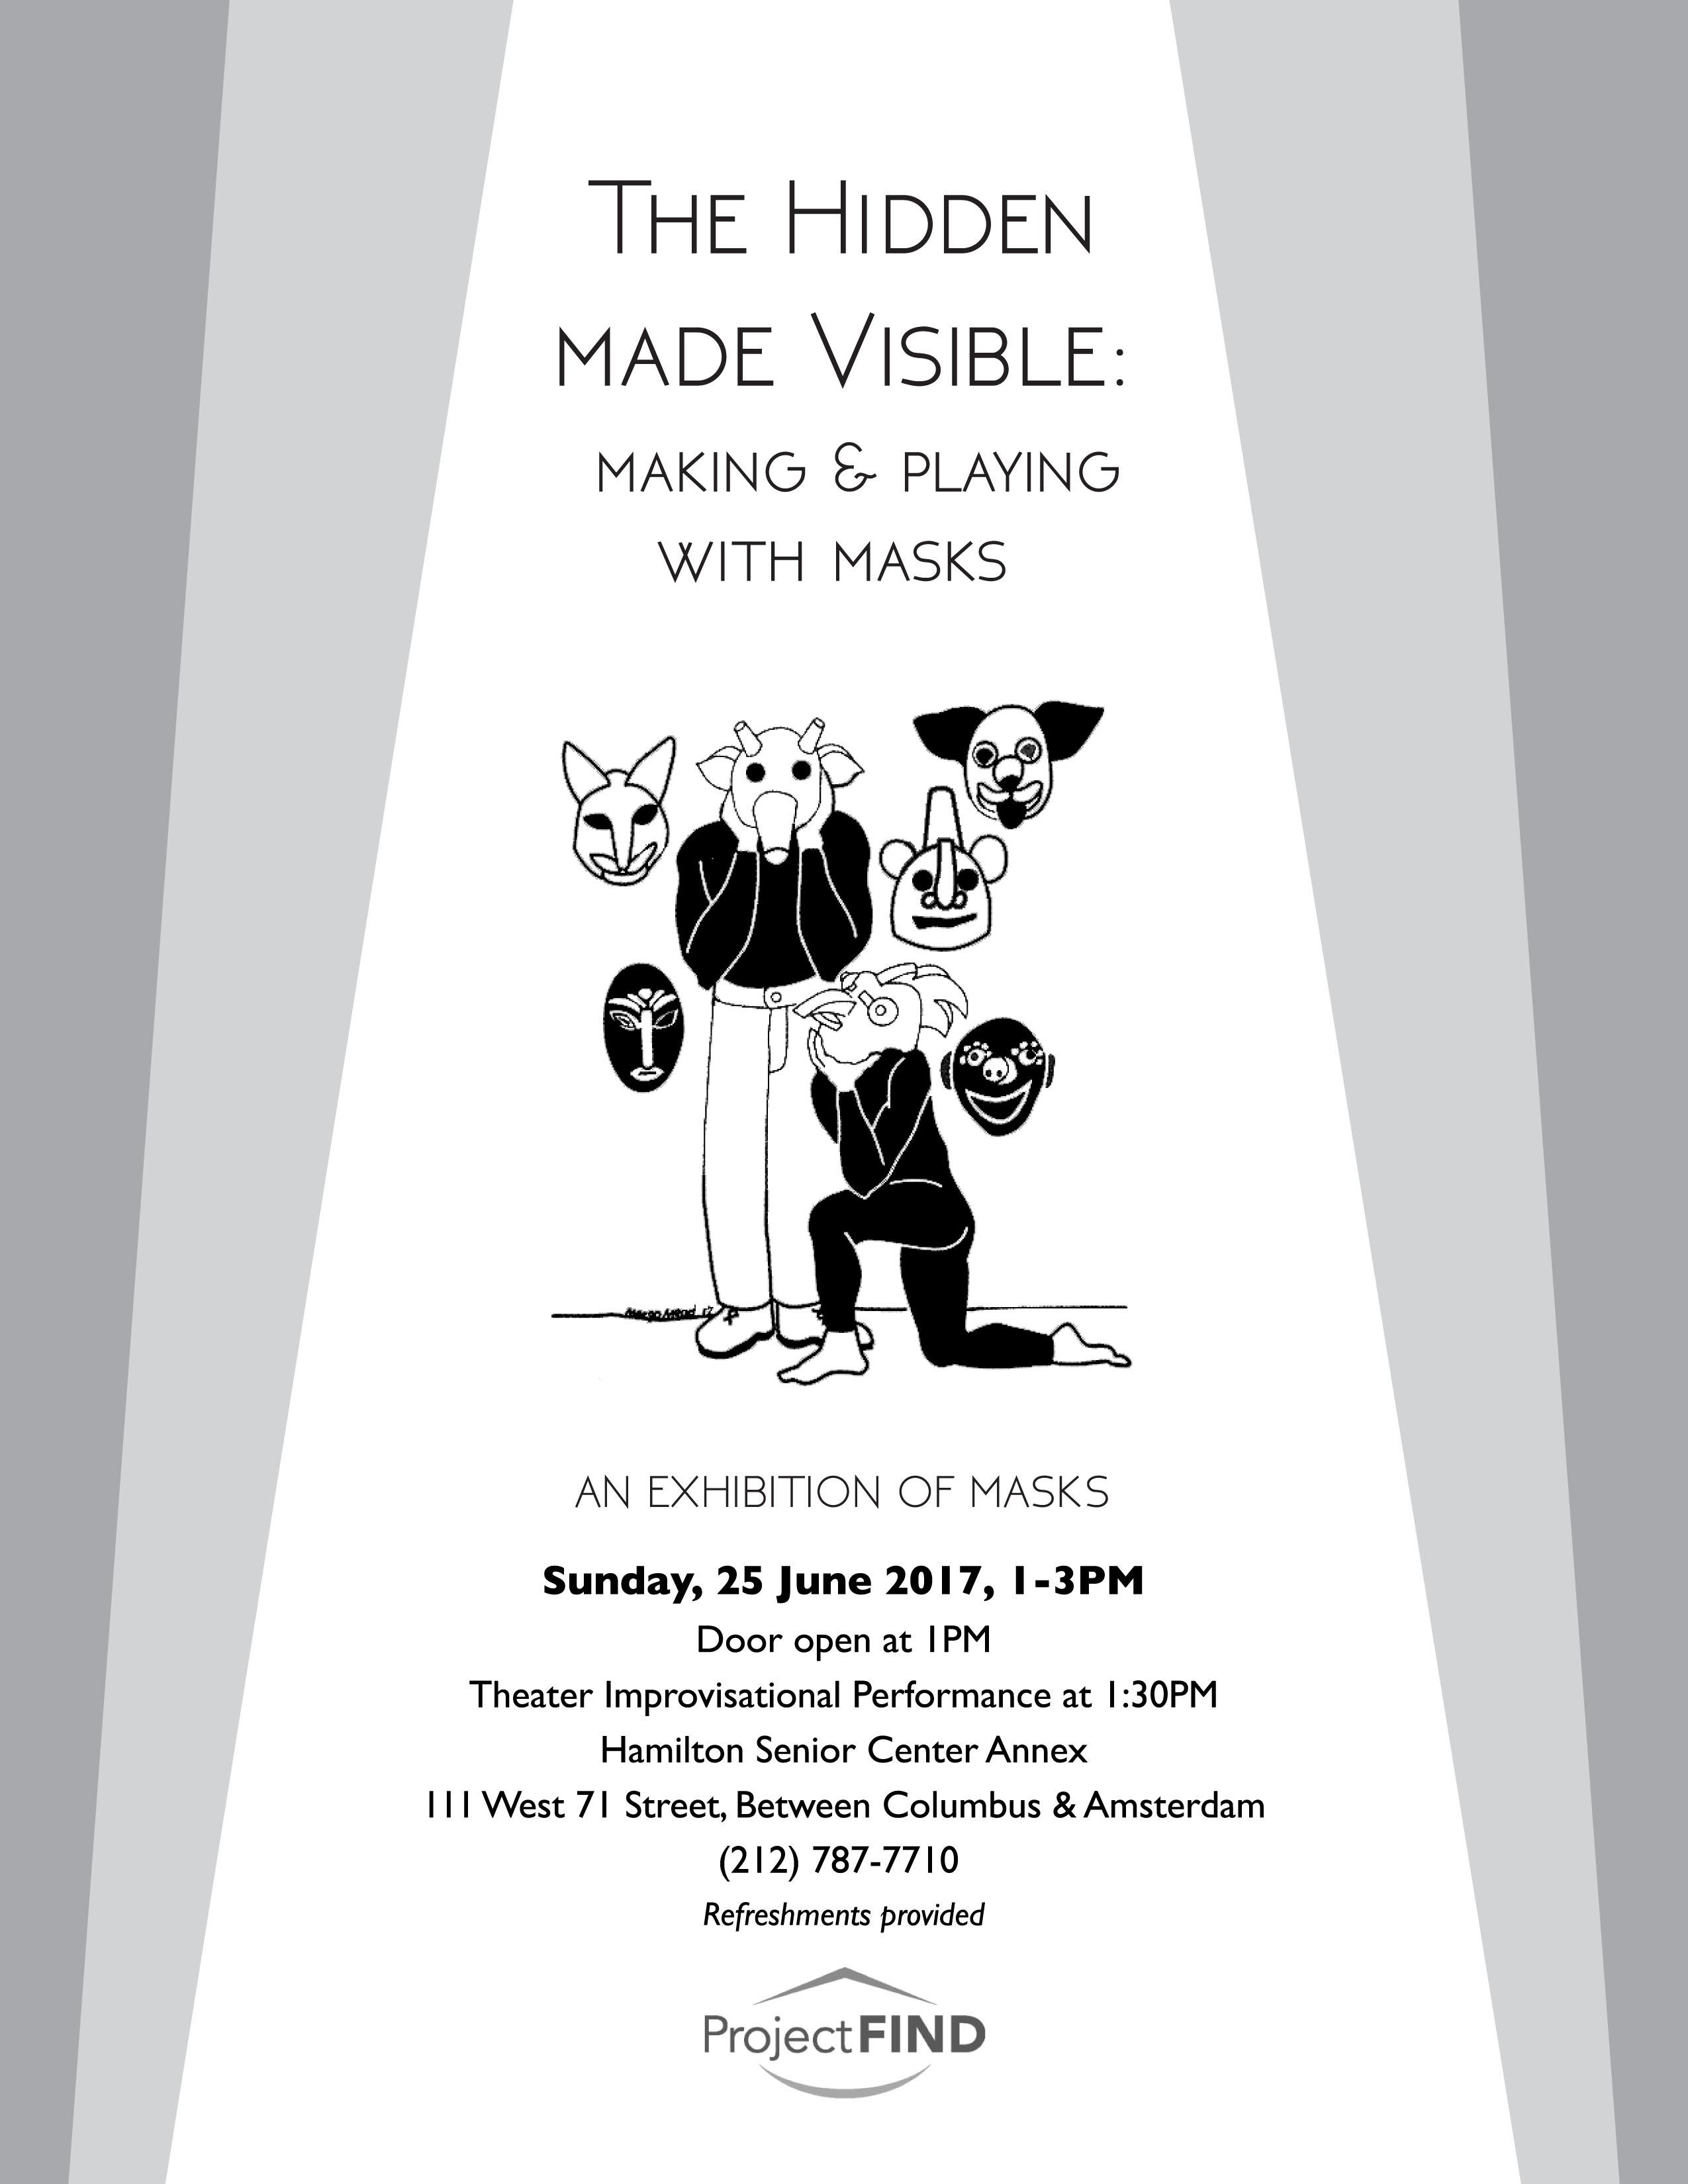 Masks_Event_June_25th.jpg